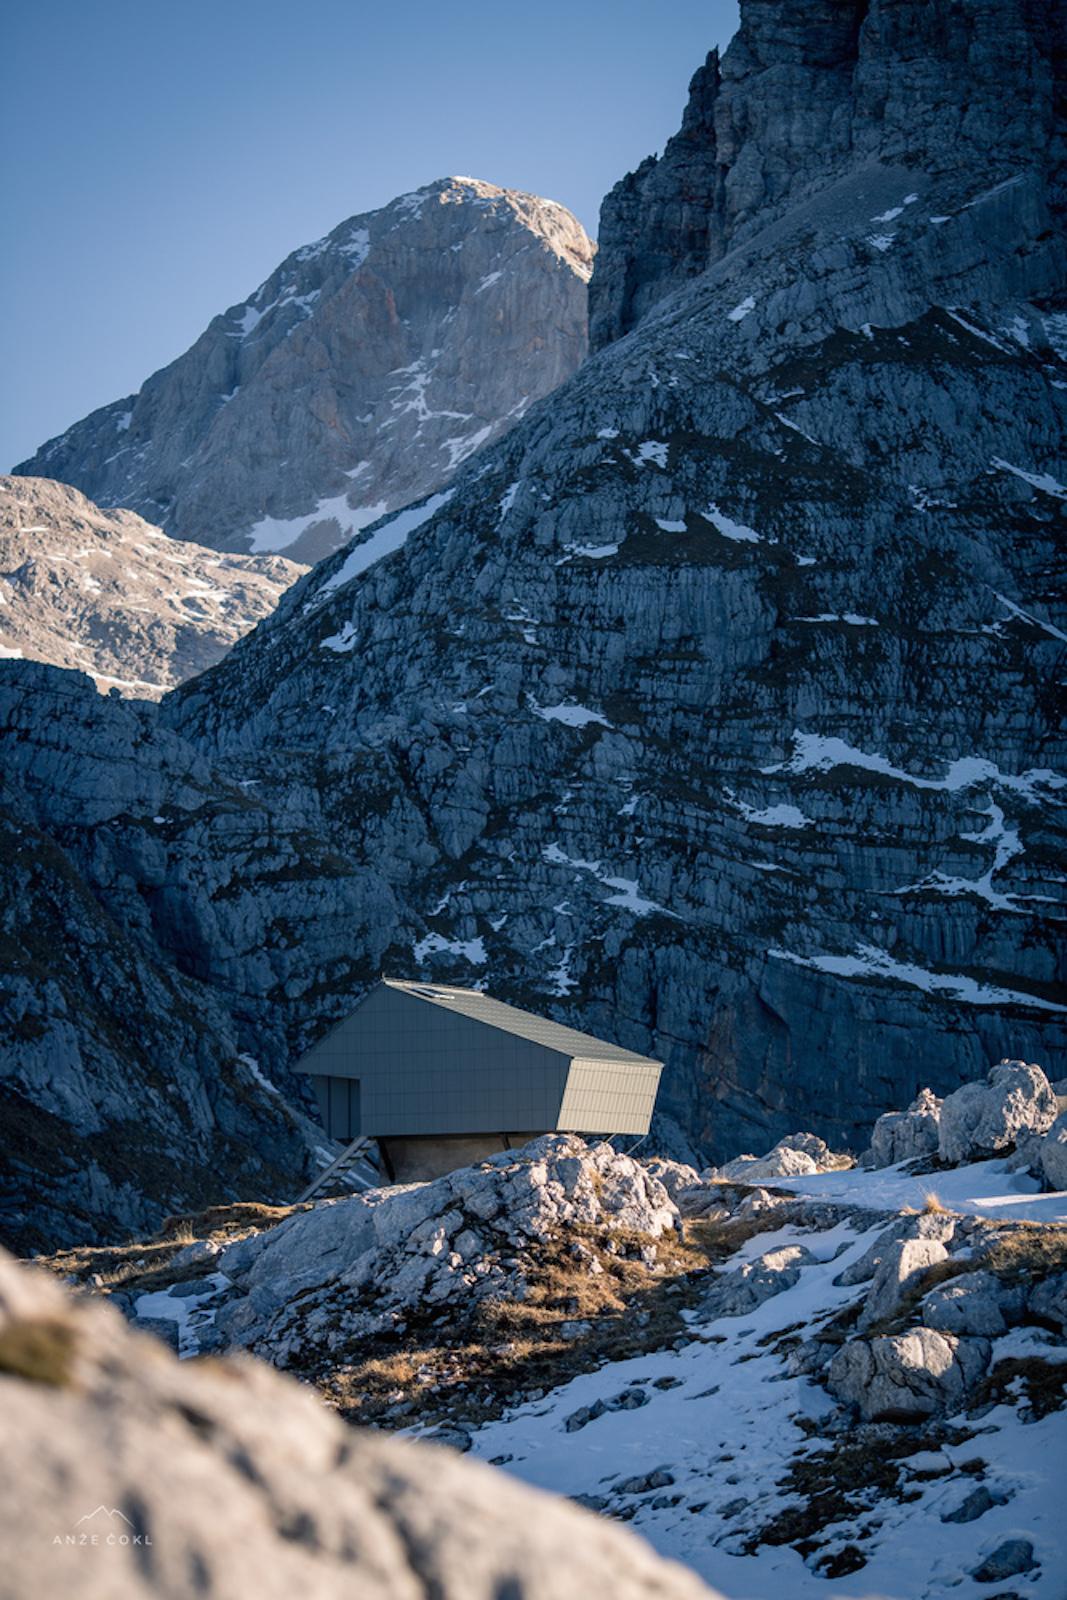 architecture_alpineshelter_bivaknaprehodavcih_premicaarchitects_1